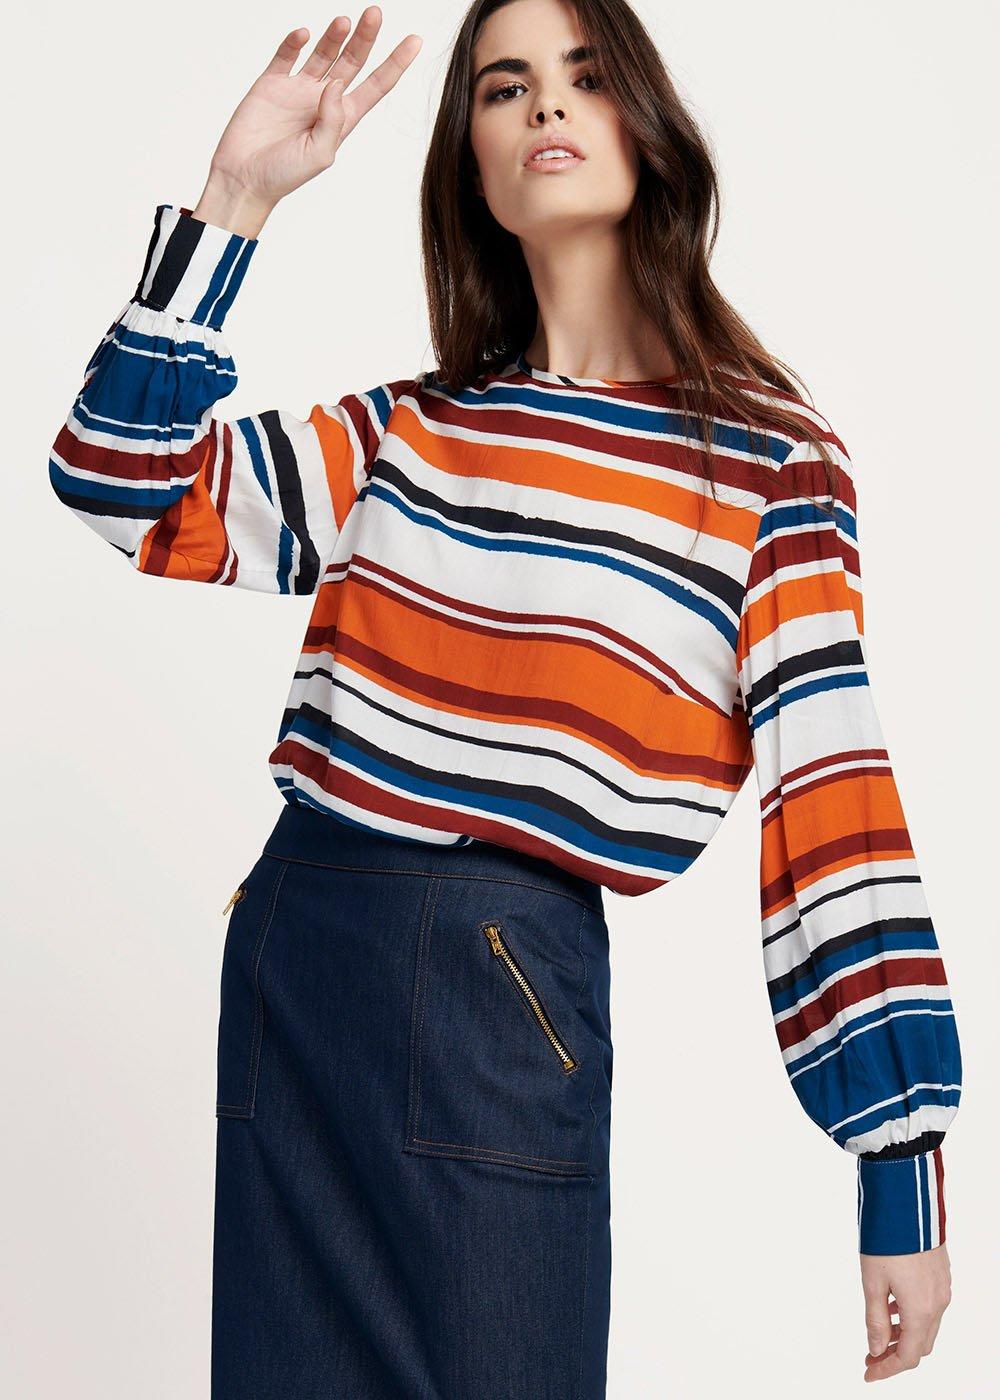 Shayla viscose T-shirt with horizontal stripes patterns - White / Marina Stripes - Woman